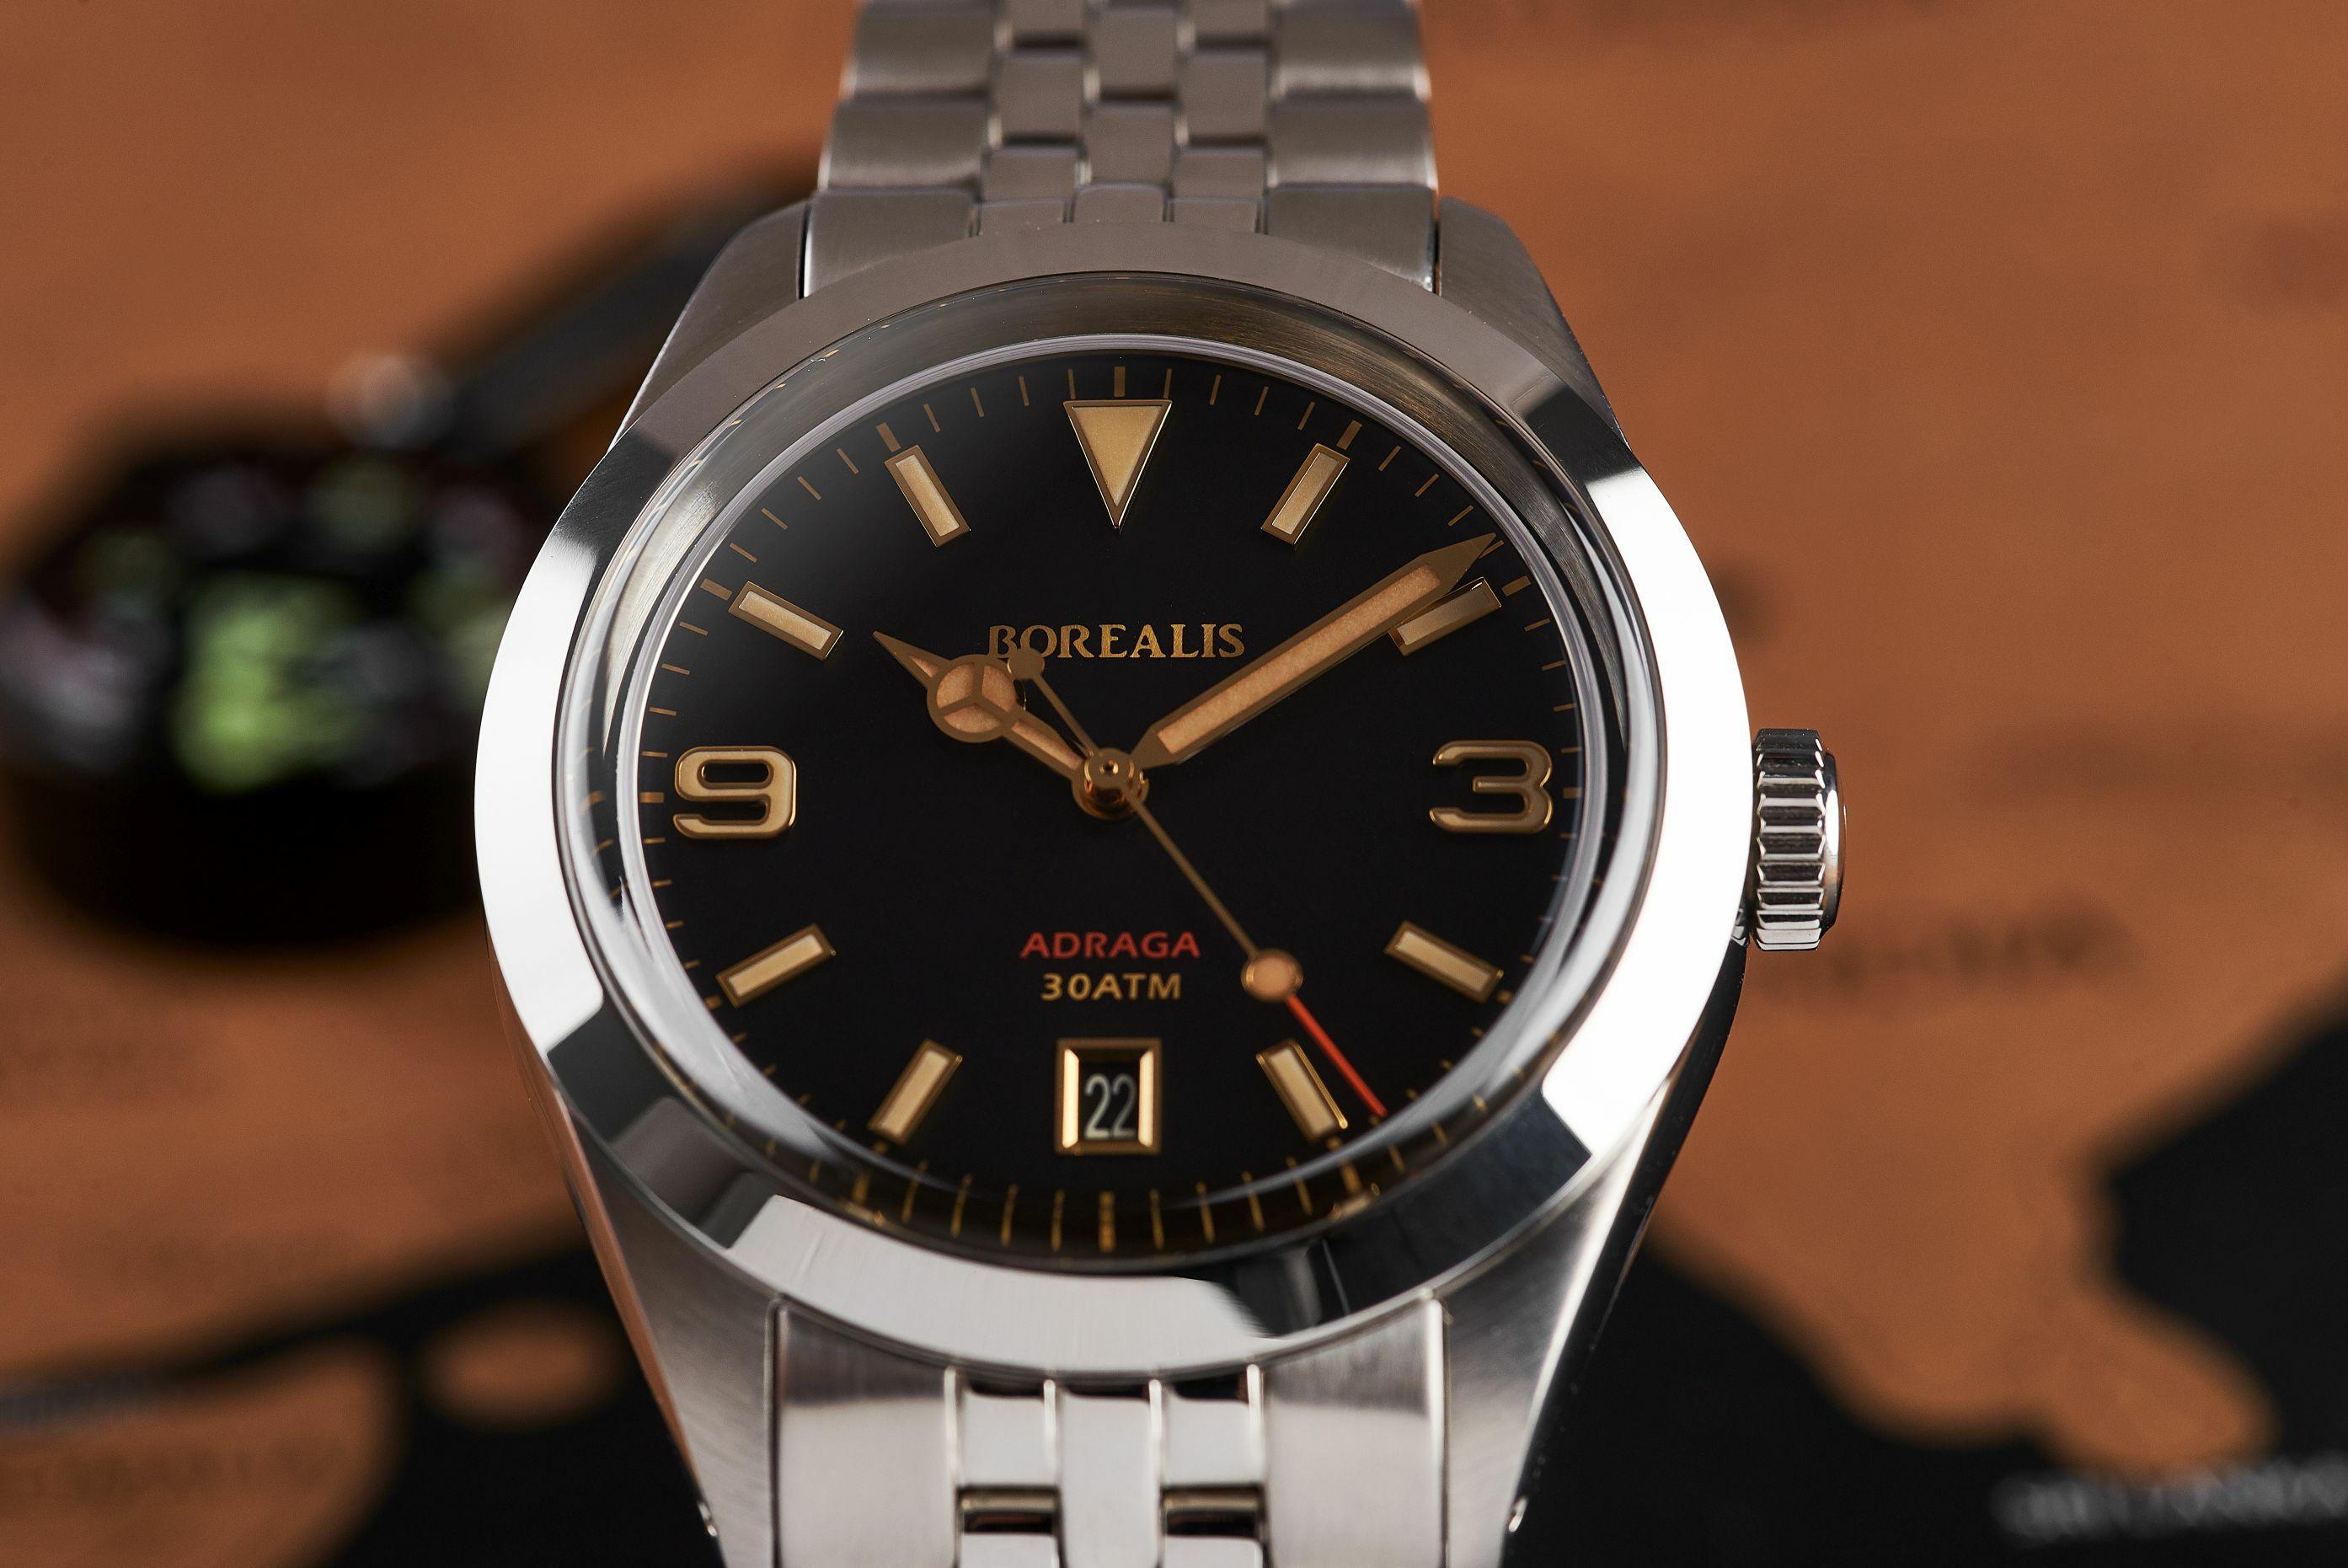 Borealis Adraga Stainless Steel Miyota 9015 fumed brown dial Mercedes Hands Date Old Radium X1 lume ADRAGA2BB1